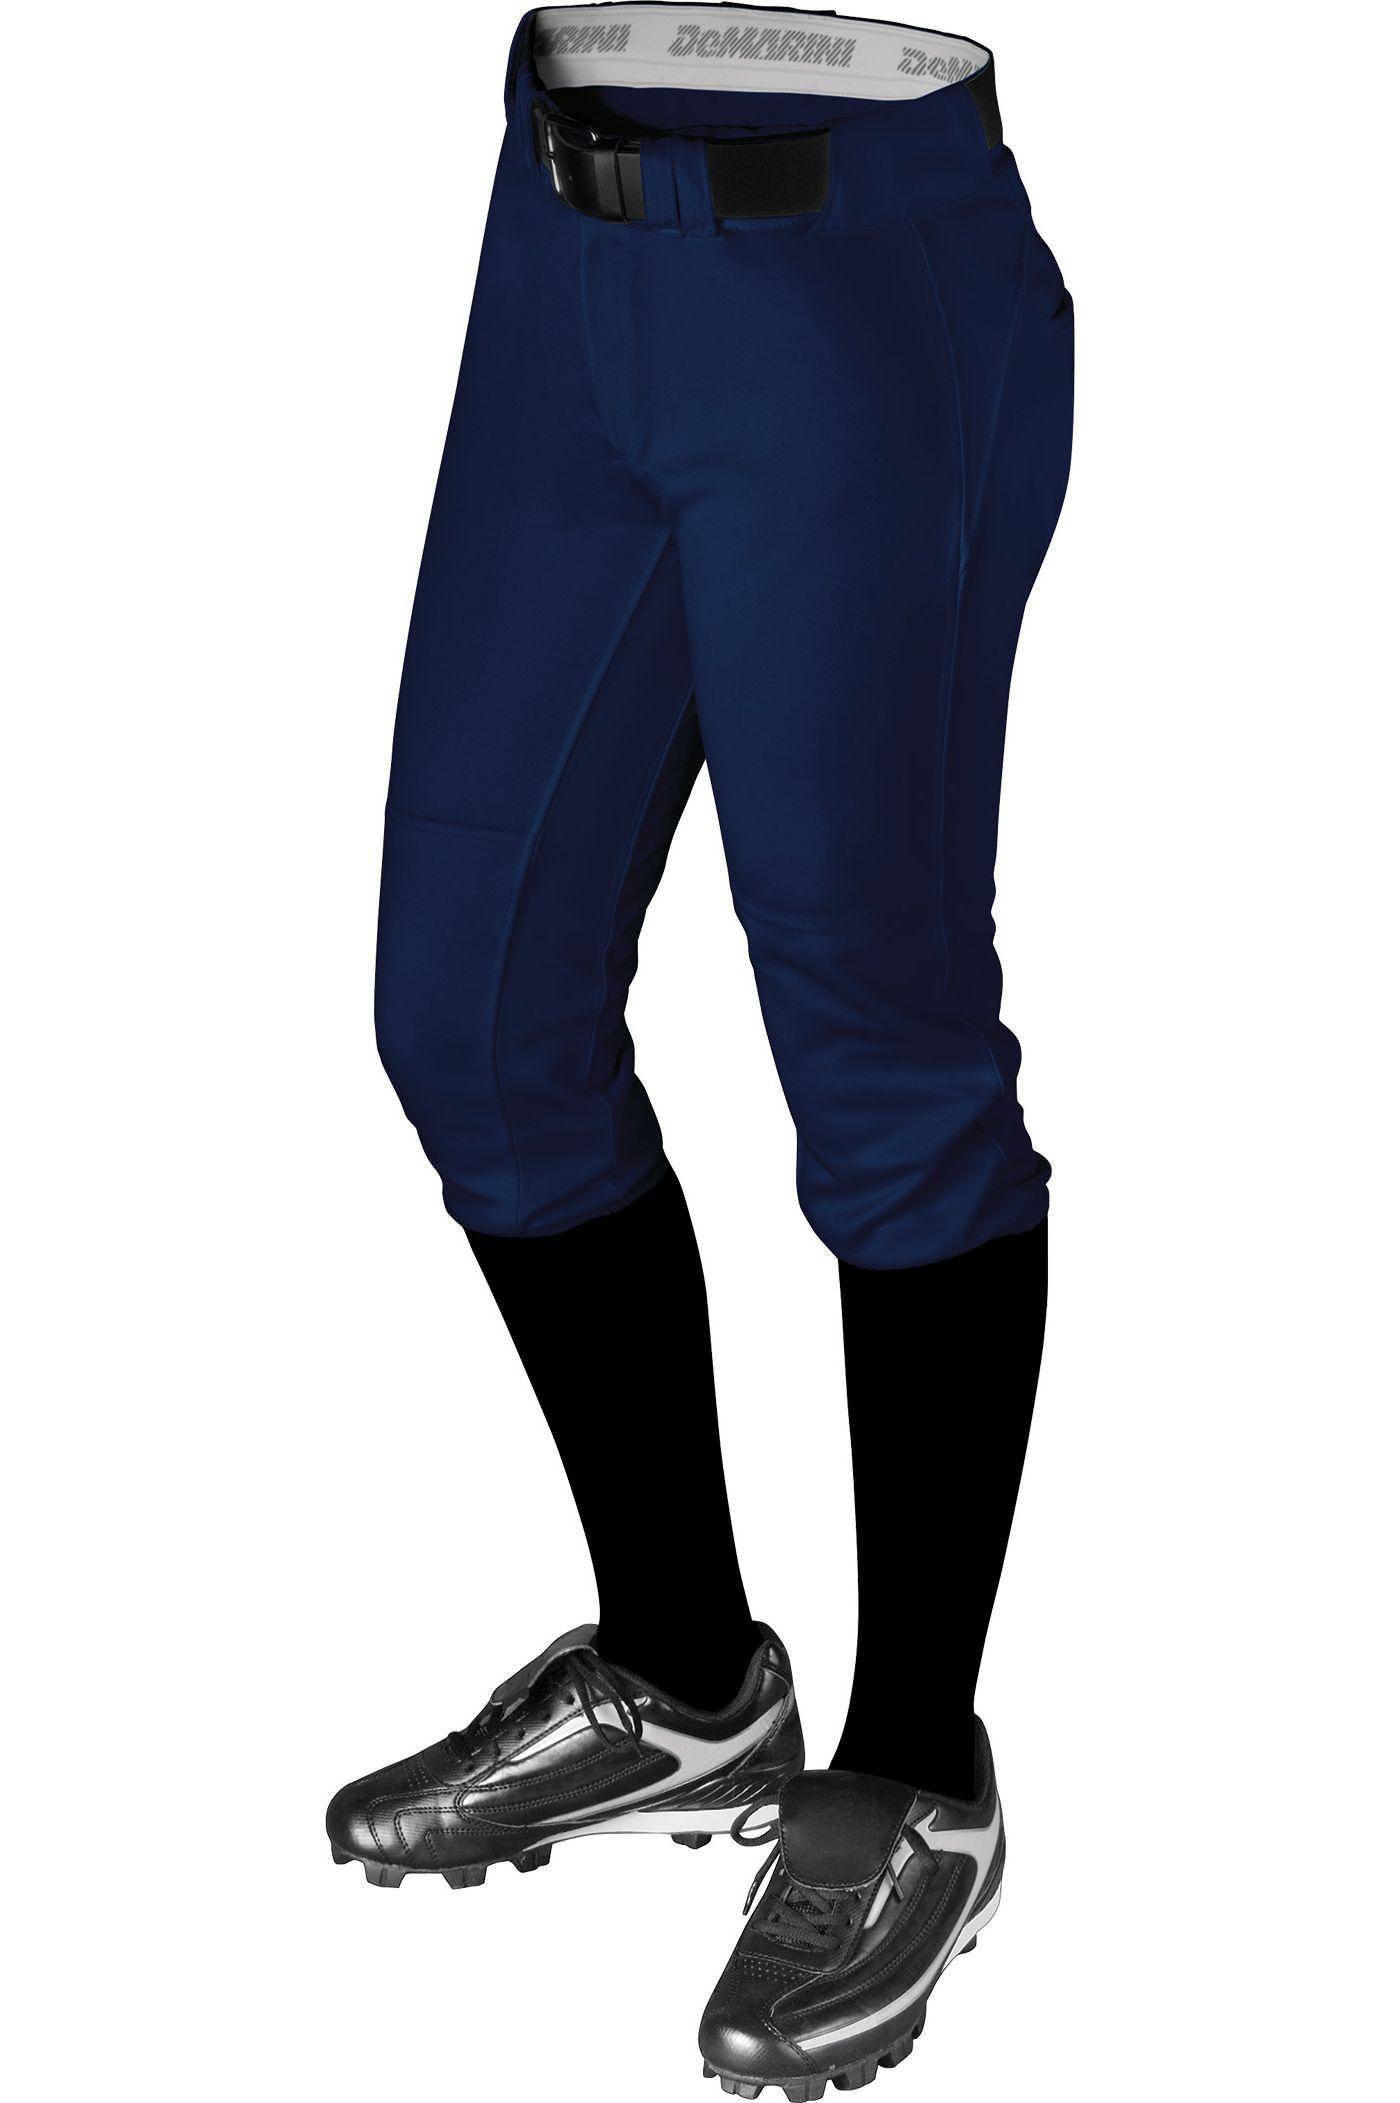 DeMarini Women's Uprising Softball Pants